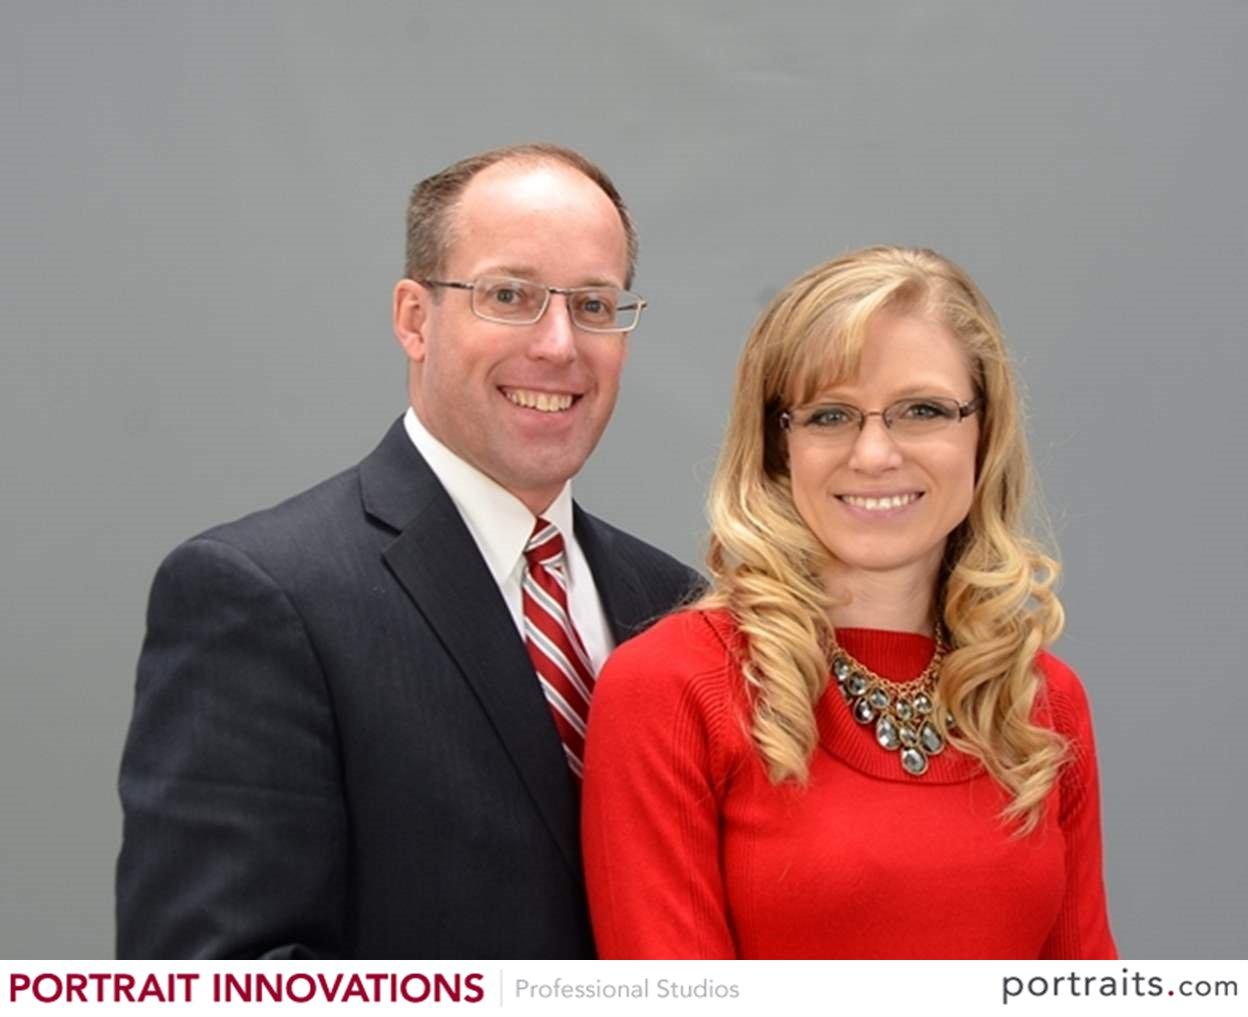 Matt and Johanna Hudson